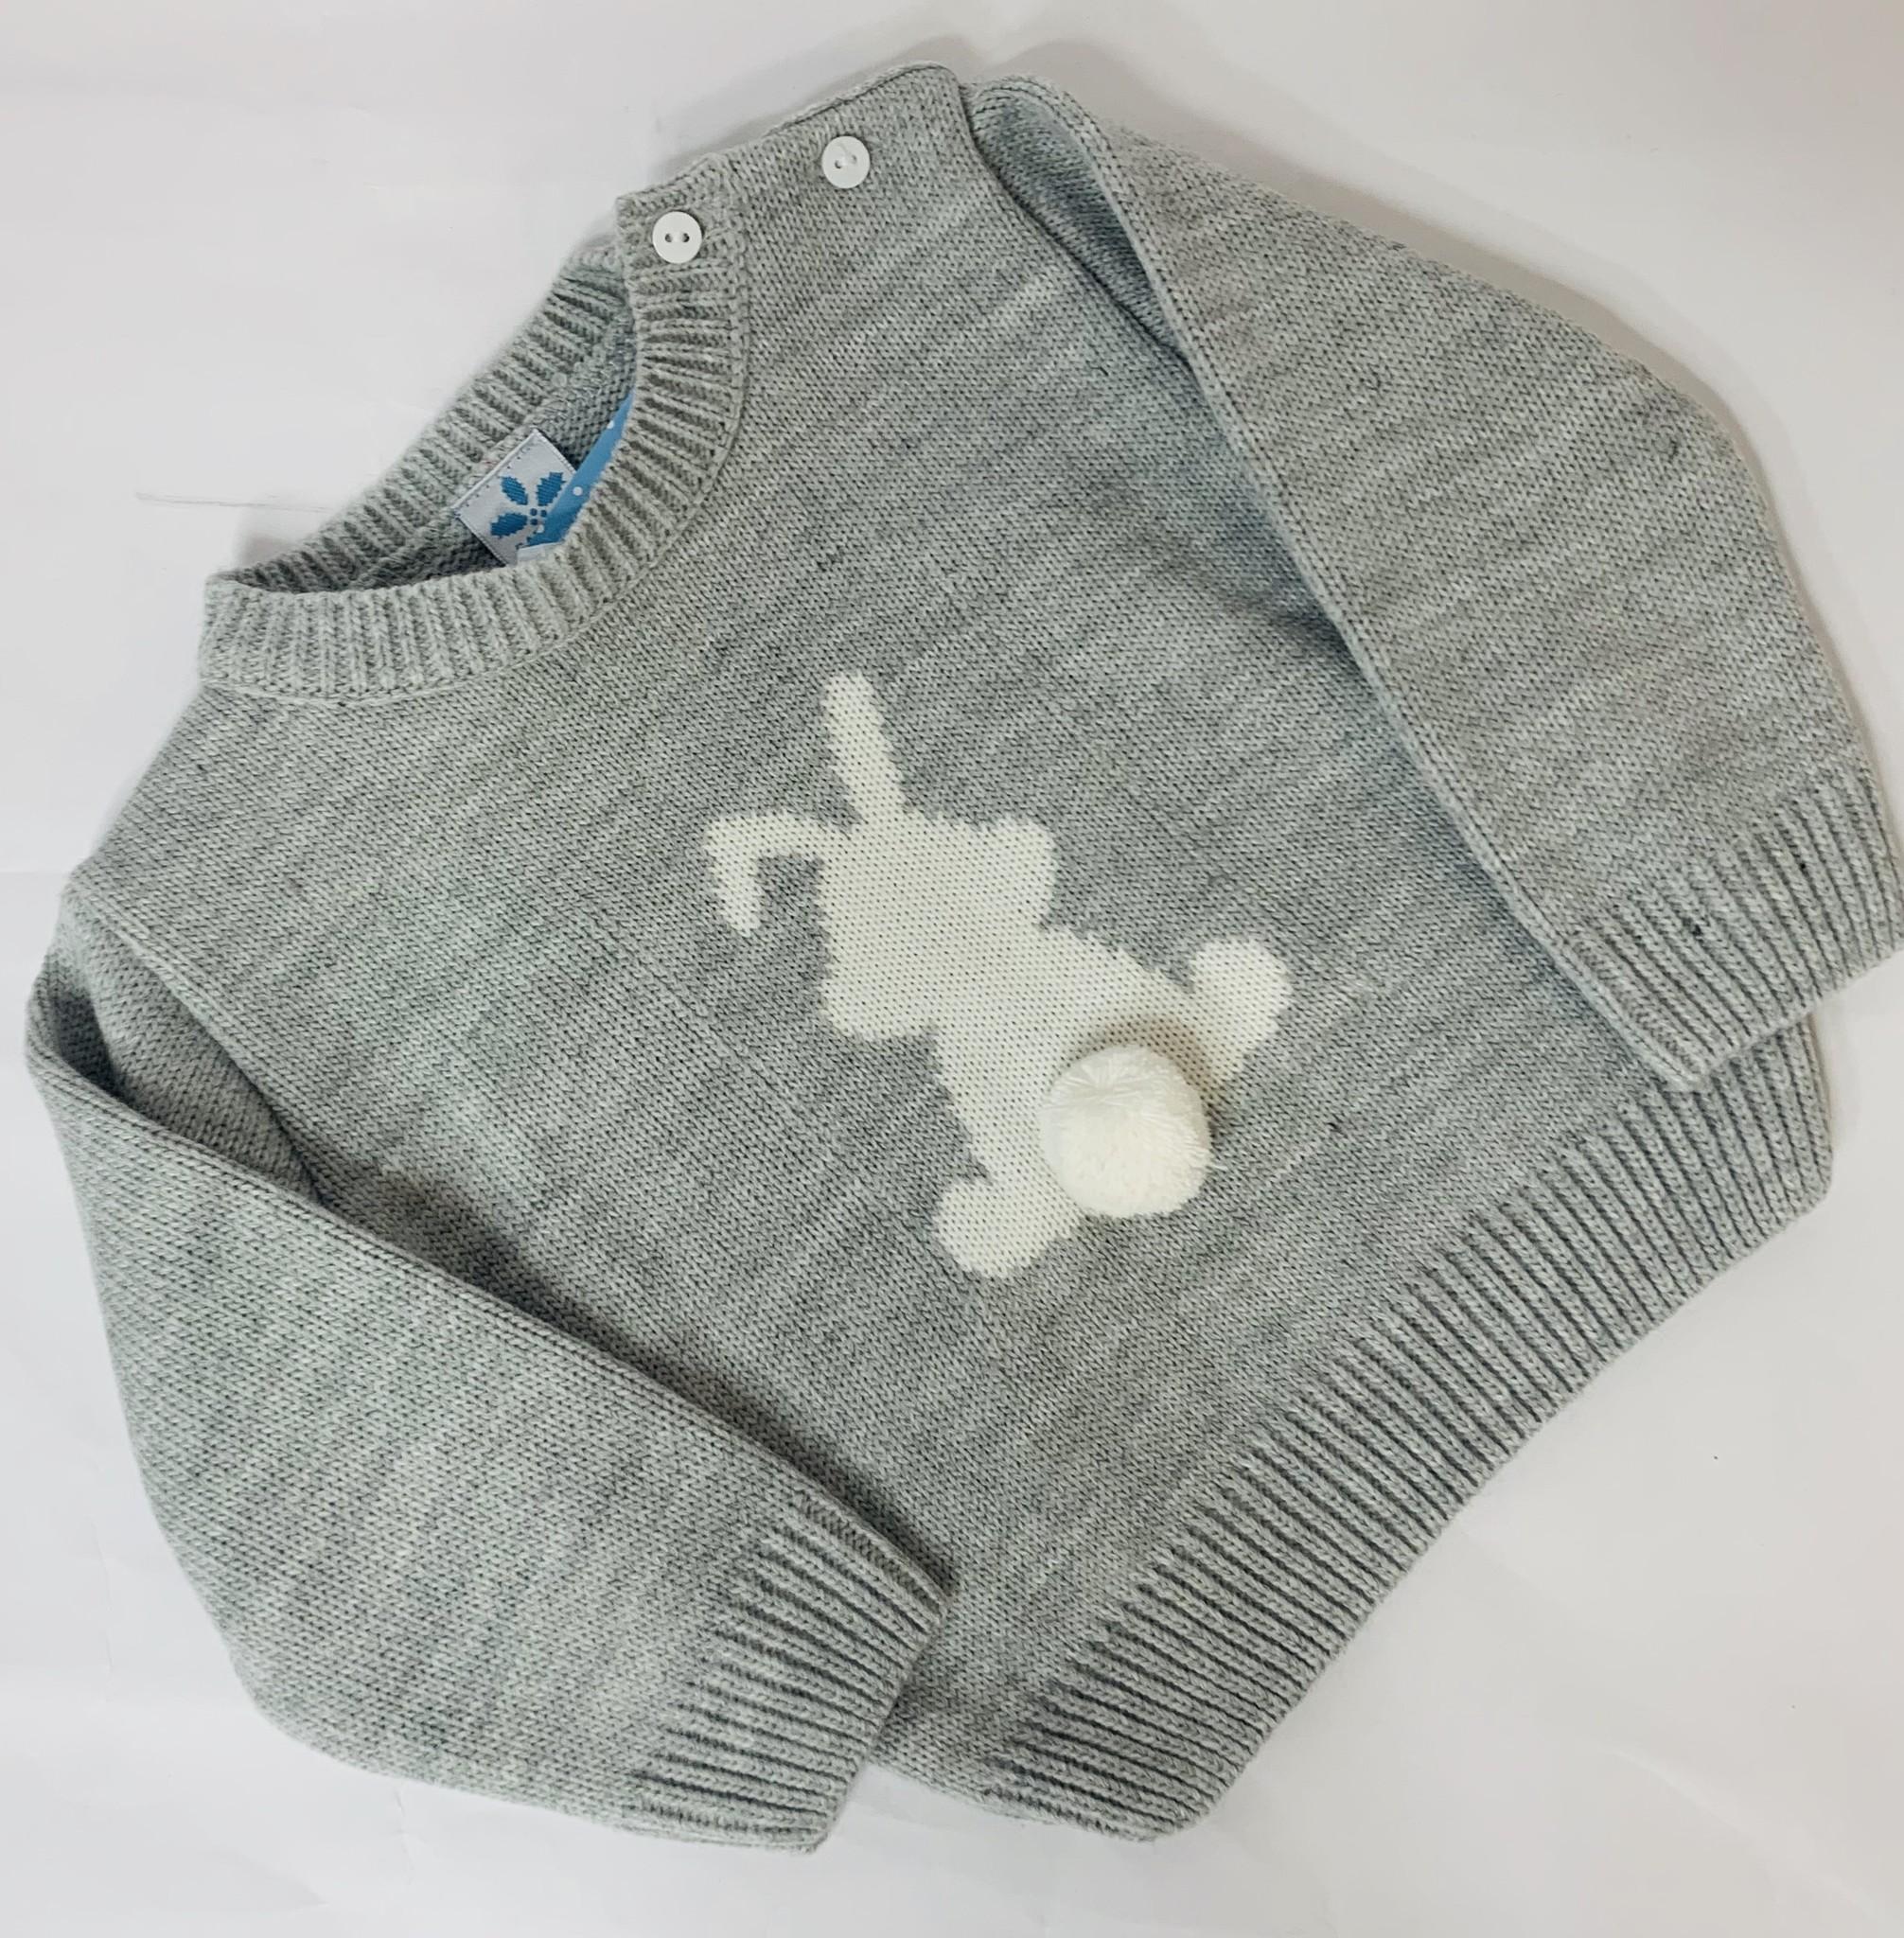 Sardon Sardon Bunny Knit Jumper